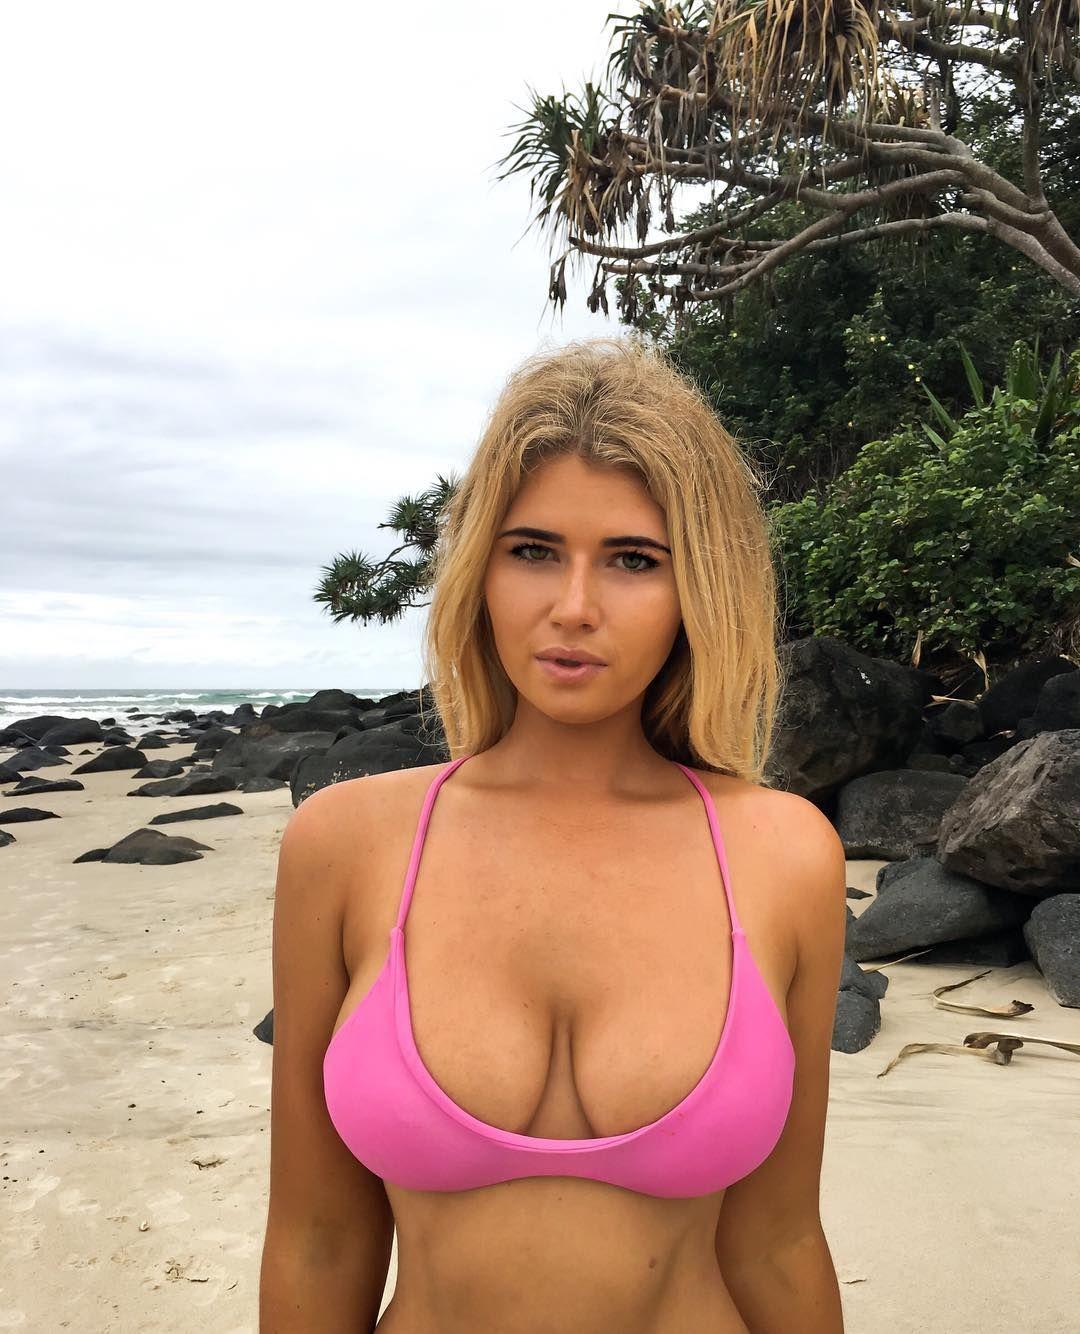 Bikini community sister type